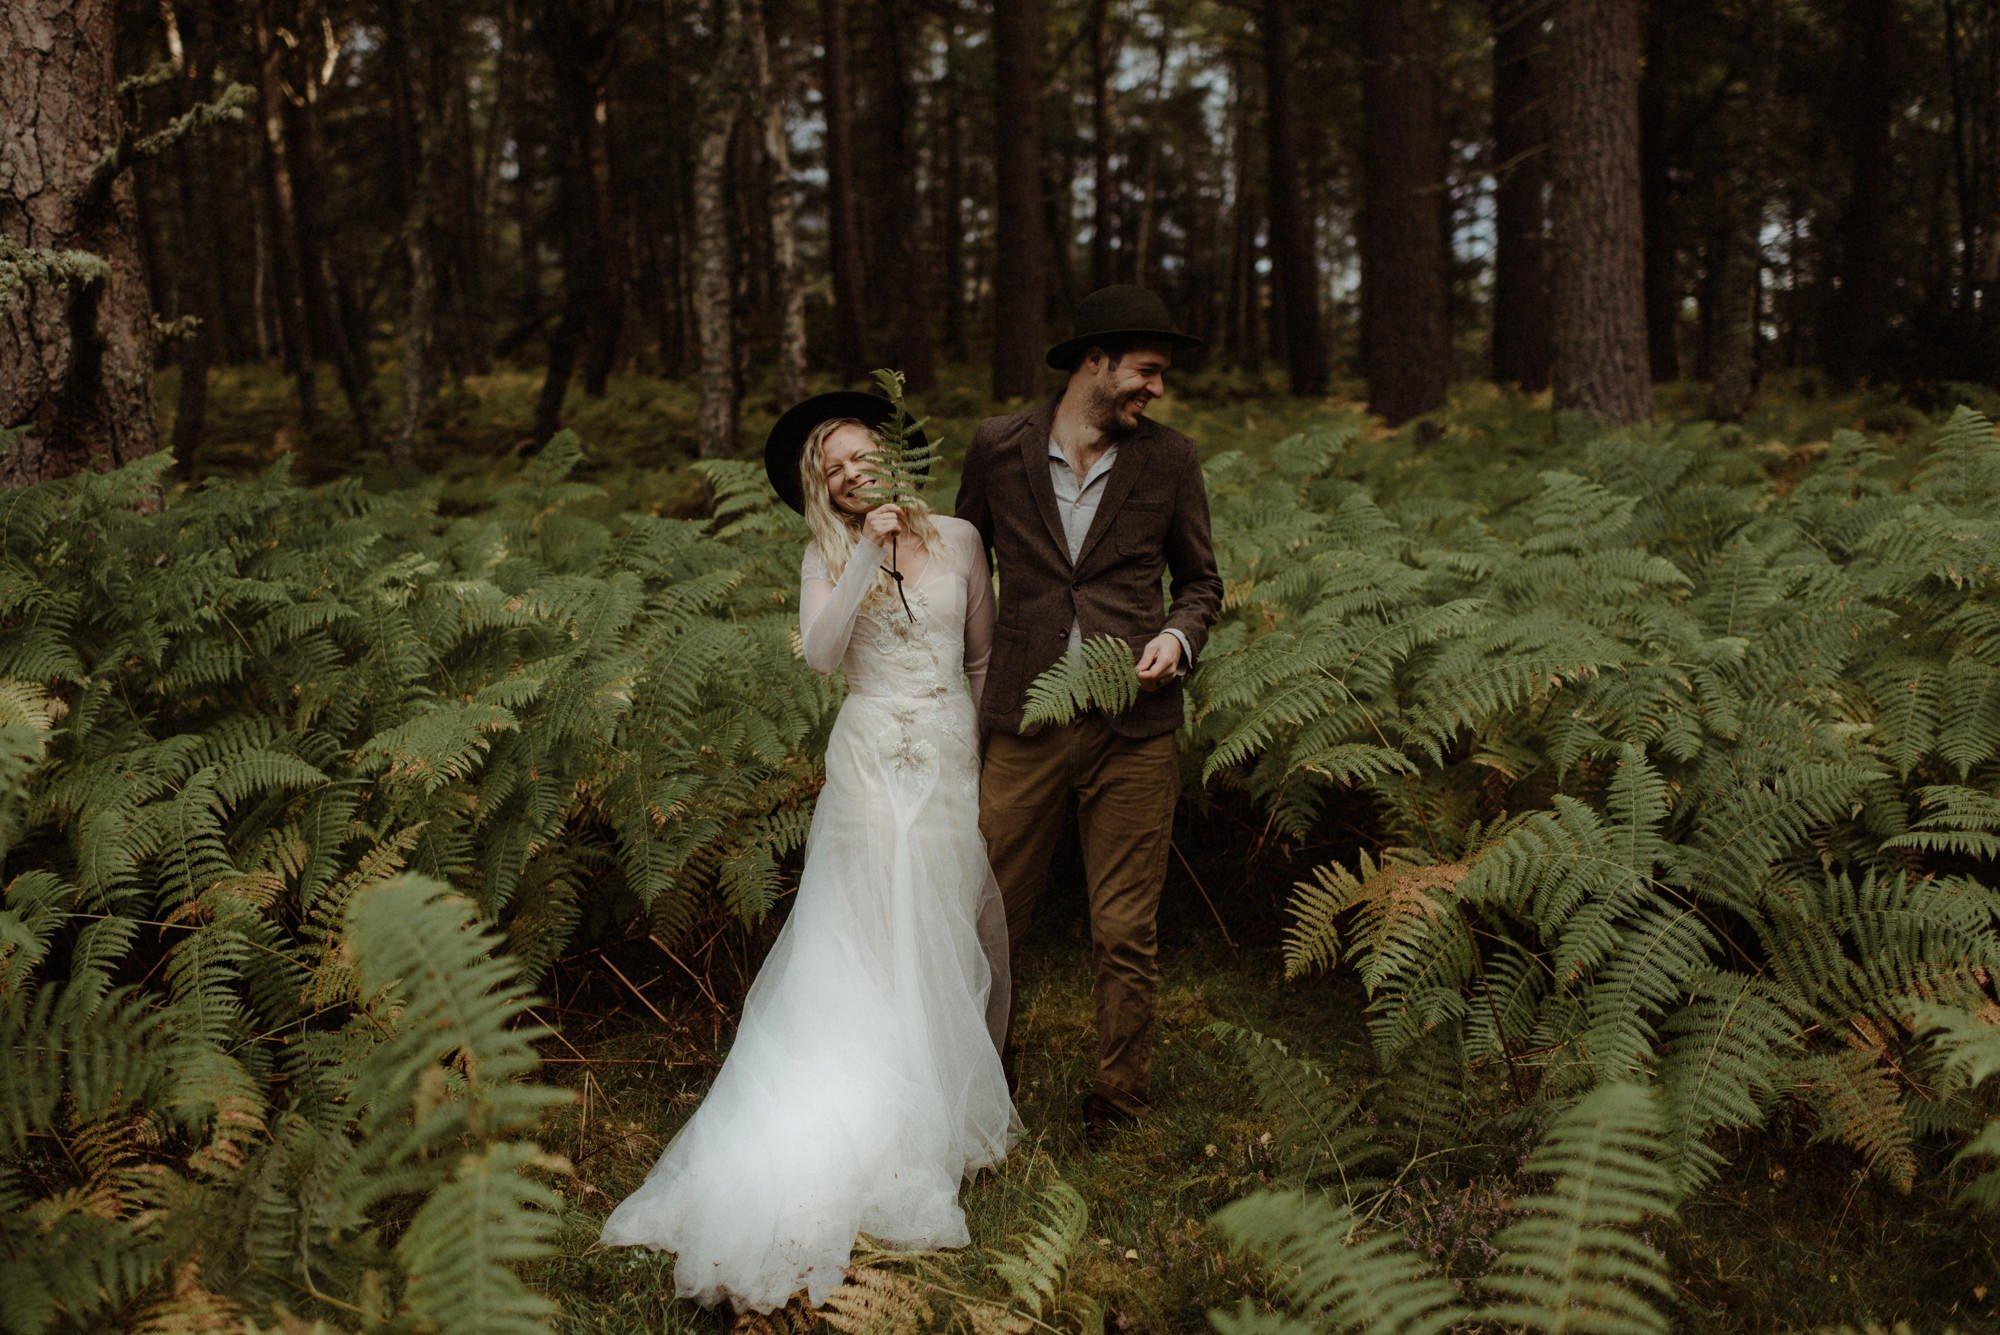 scotland wedding photographer 6 1